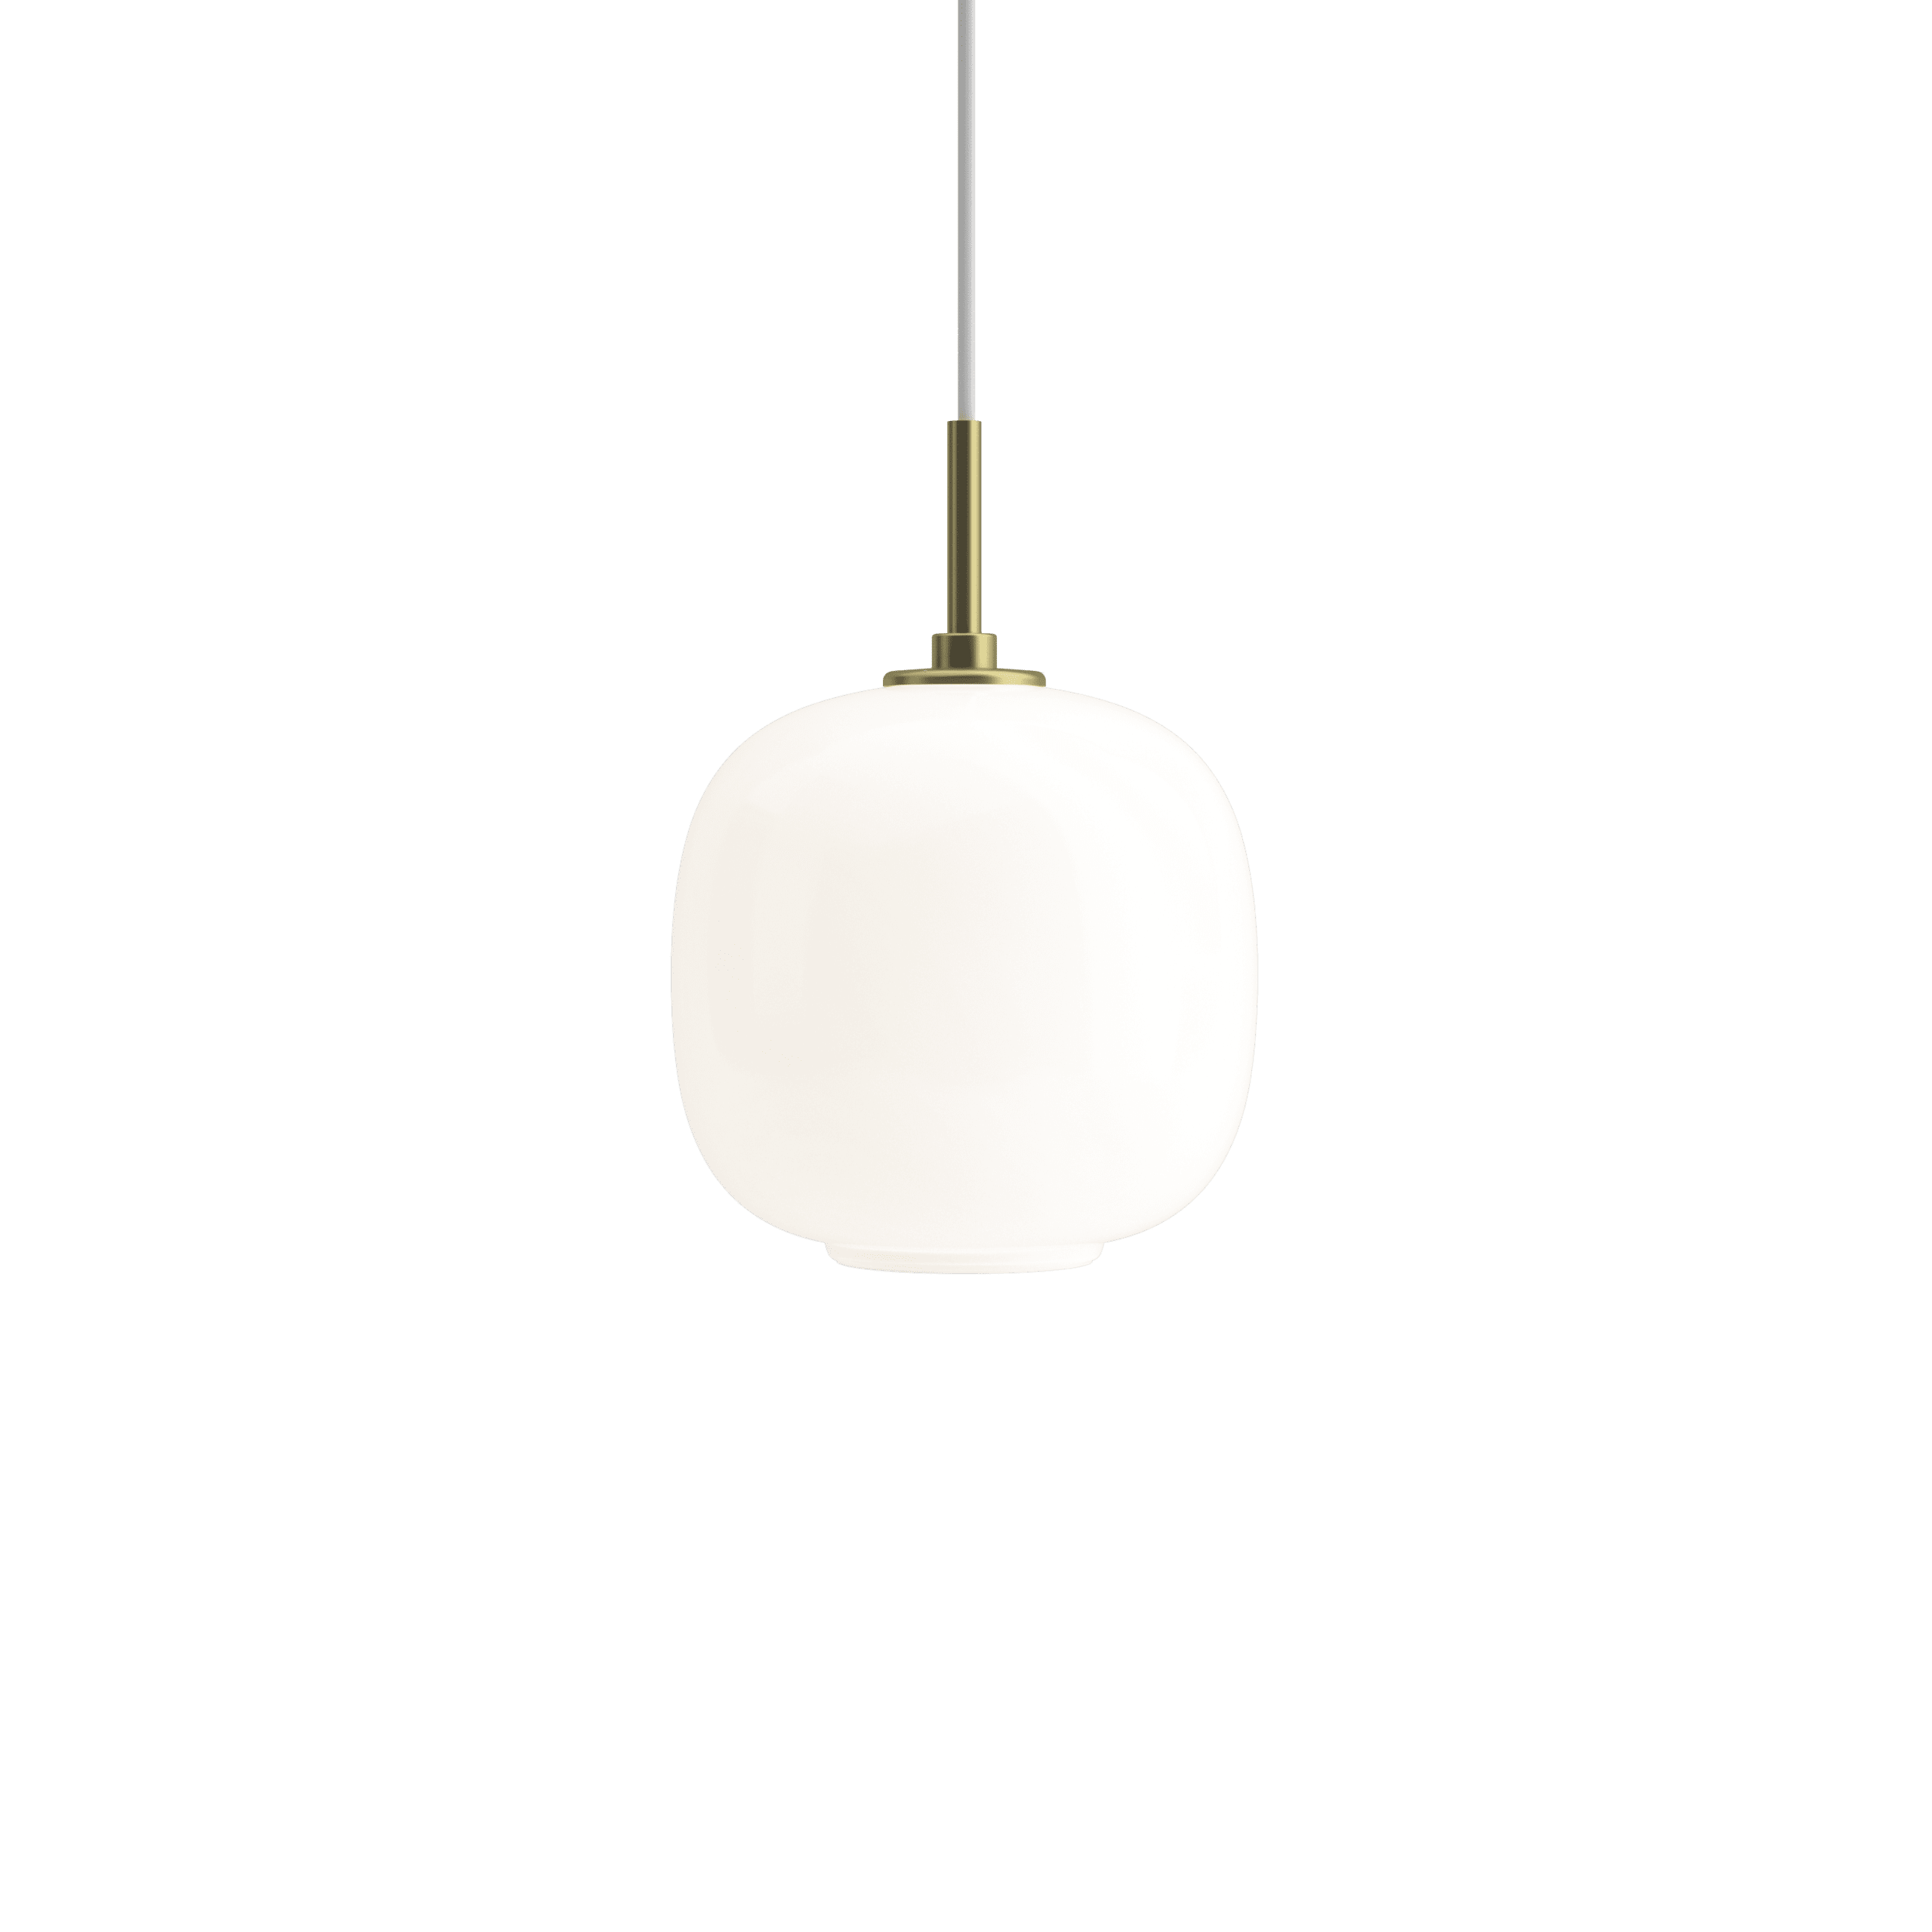 Pendel VL45 lampe louis poulsen Vilhelm Lauritzen indbo